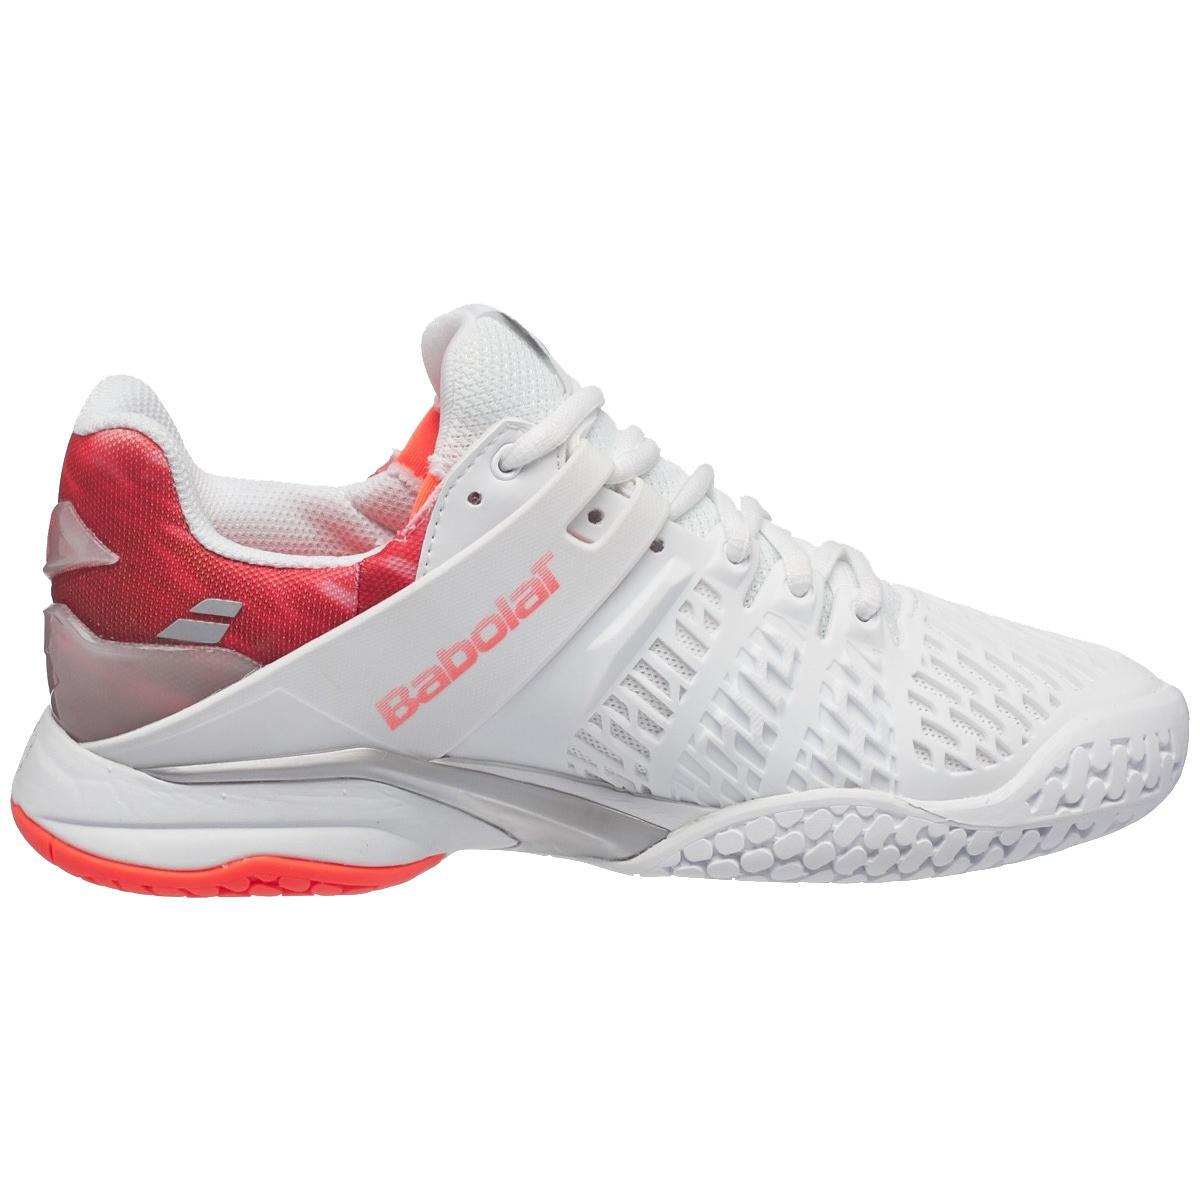 Babolat Propulse  Womens Tennis Shoes